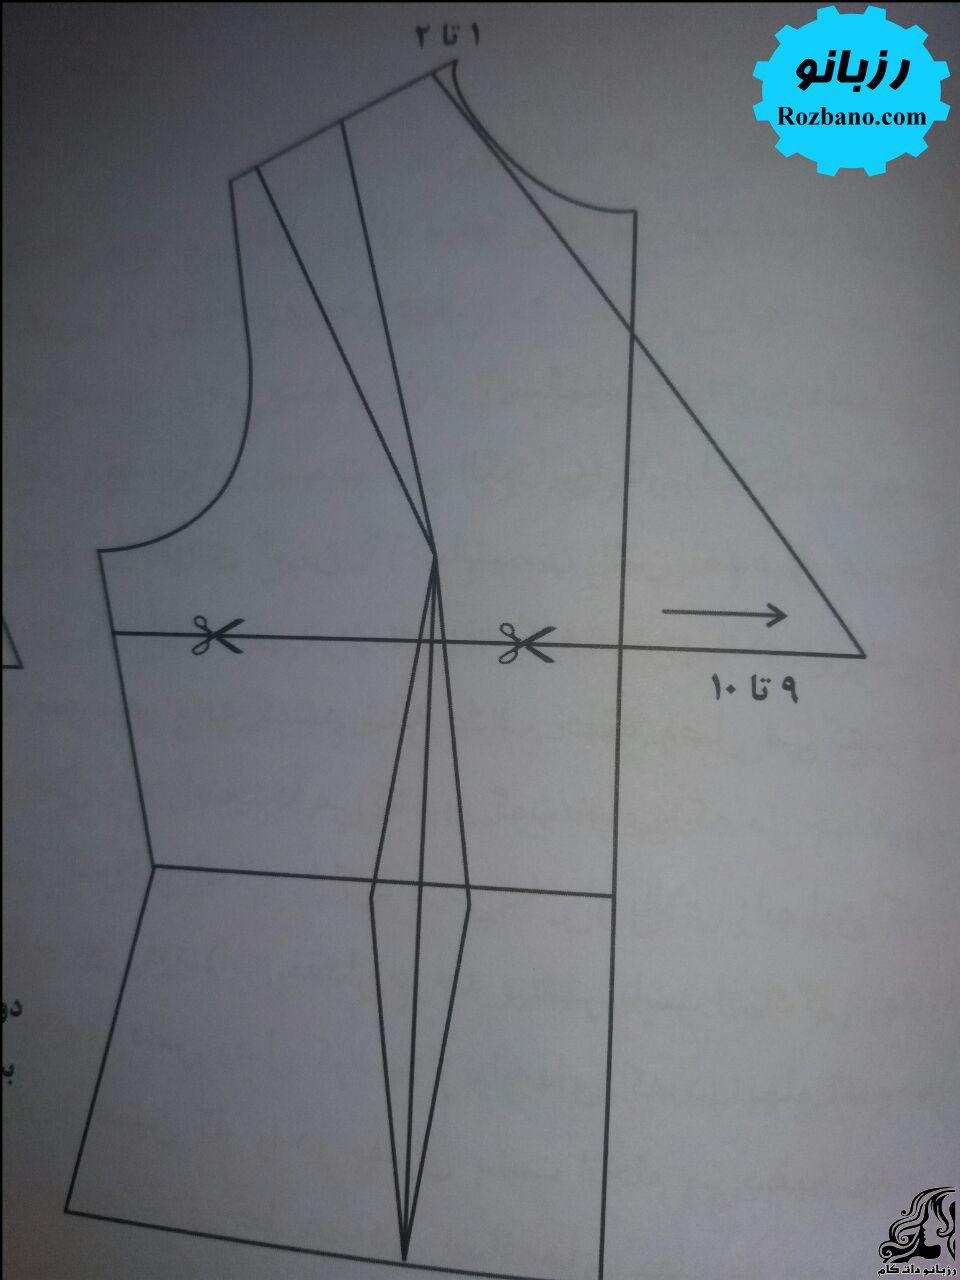 https://up.rozbano.com/view/2212088/rozbano-504-1.jpg